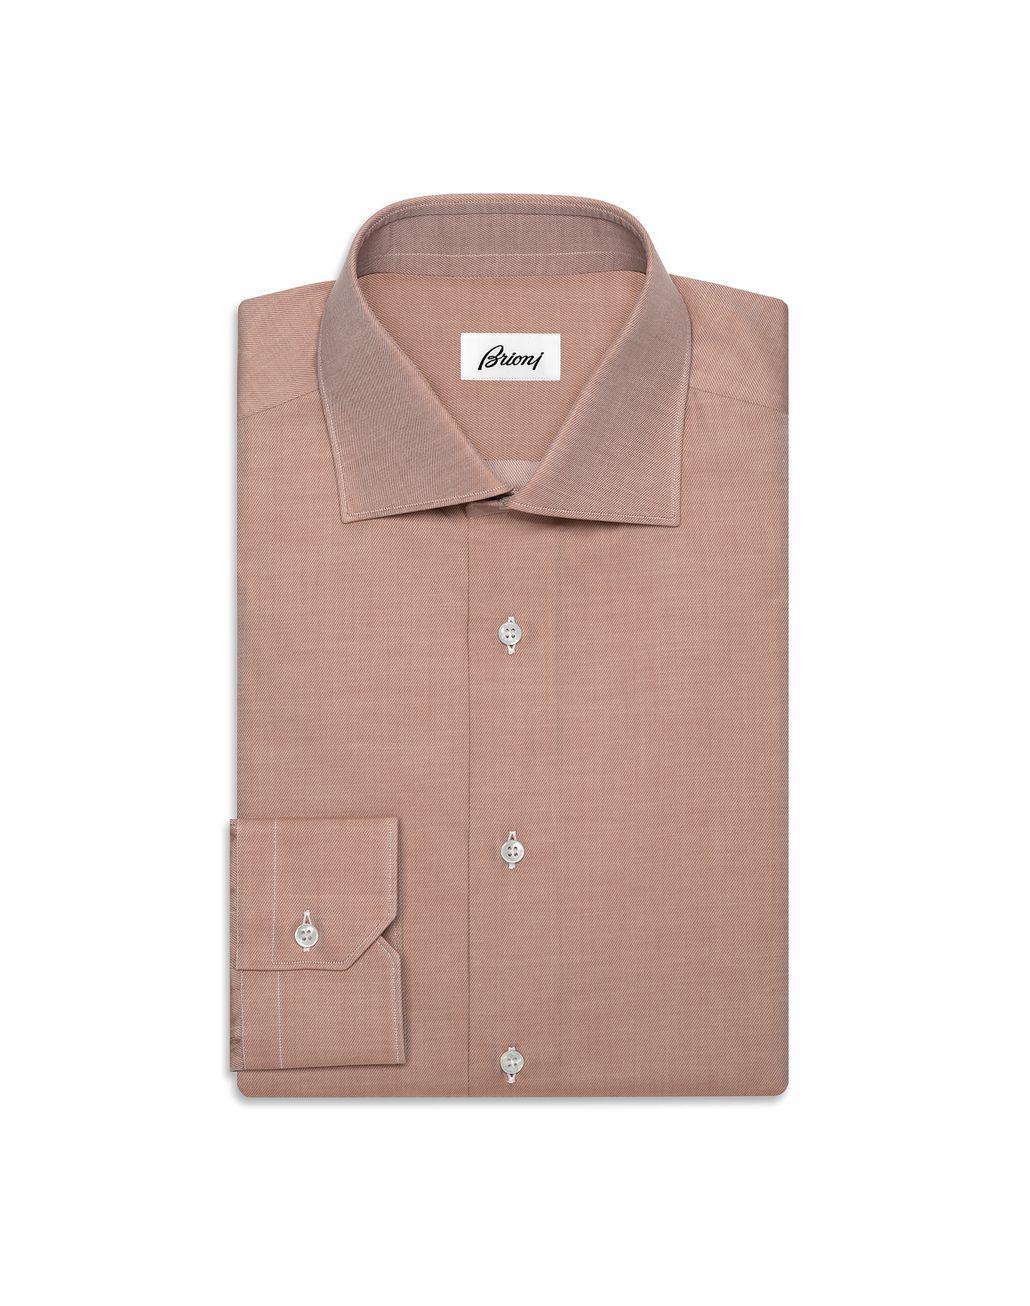 BRIONI フィッテッドシャツ ツイル ウィスキー フォーマルシャツ U f